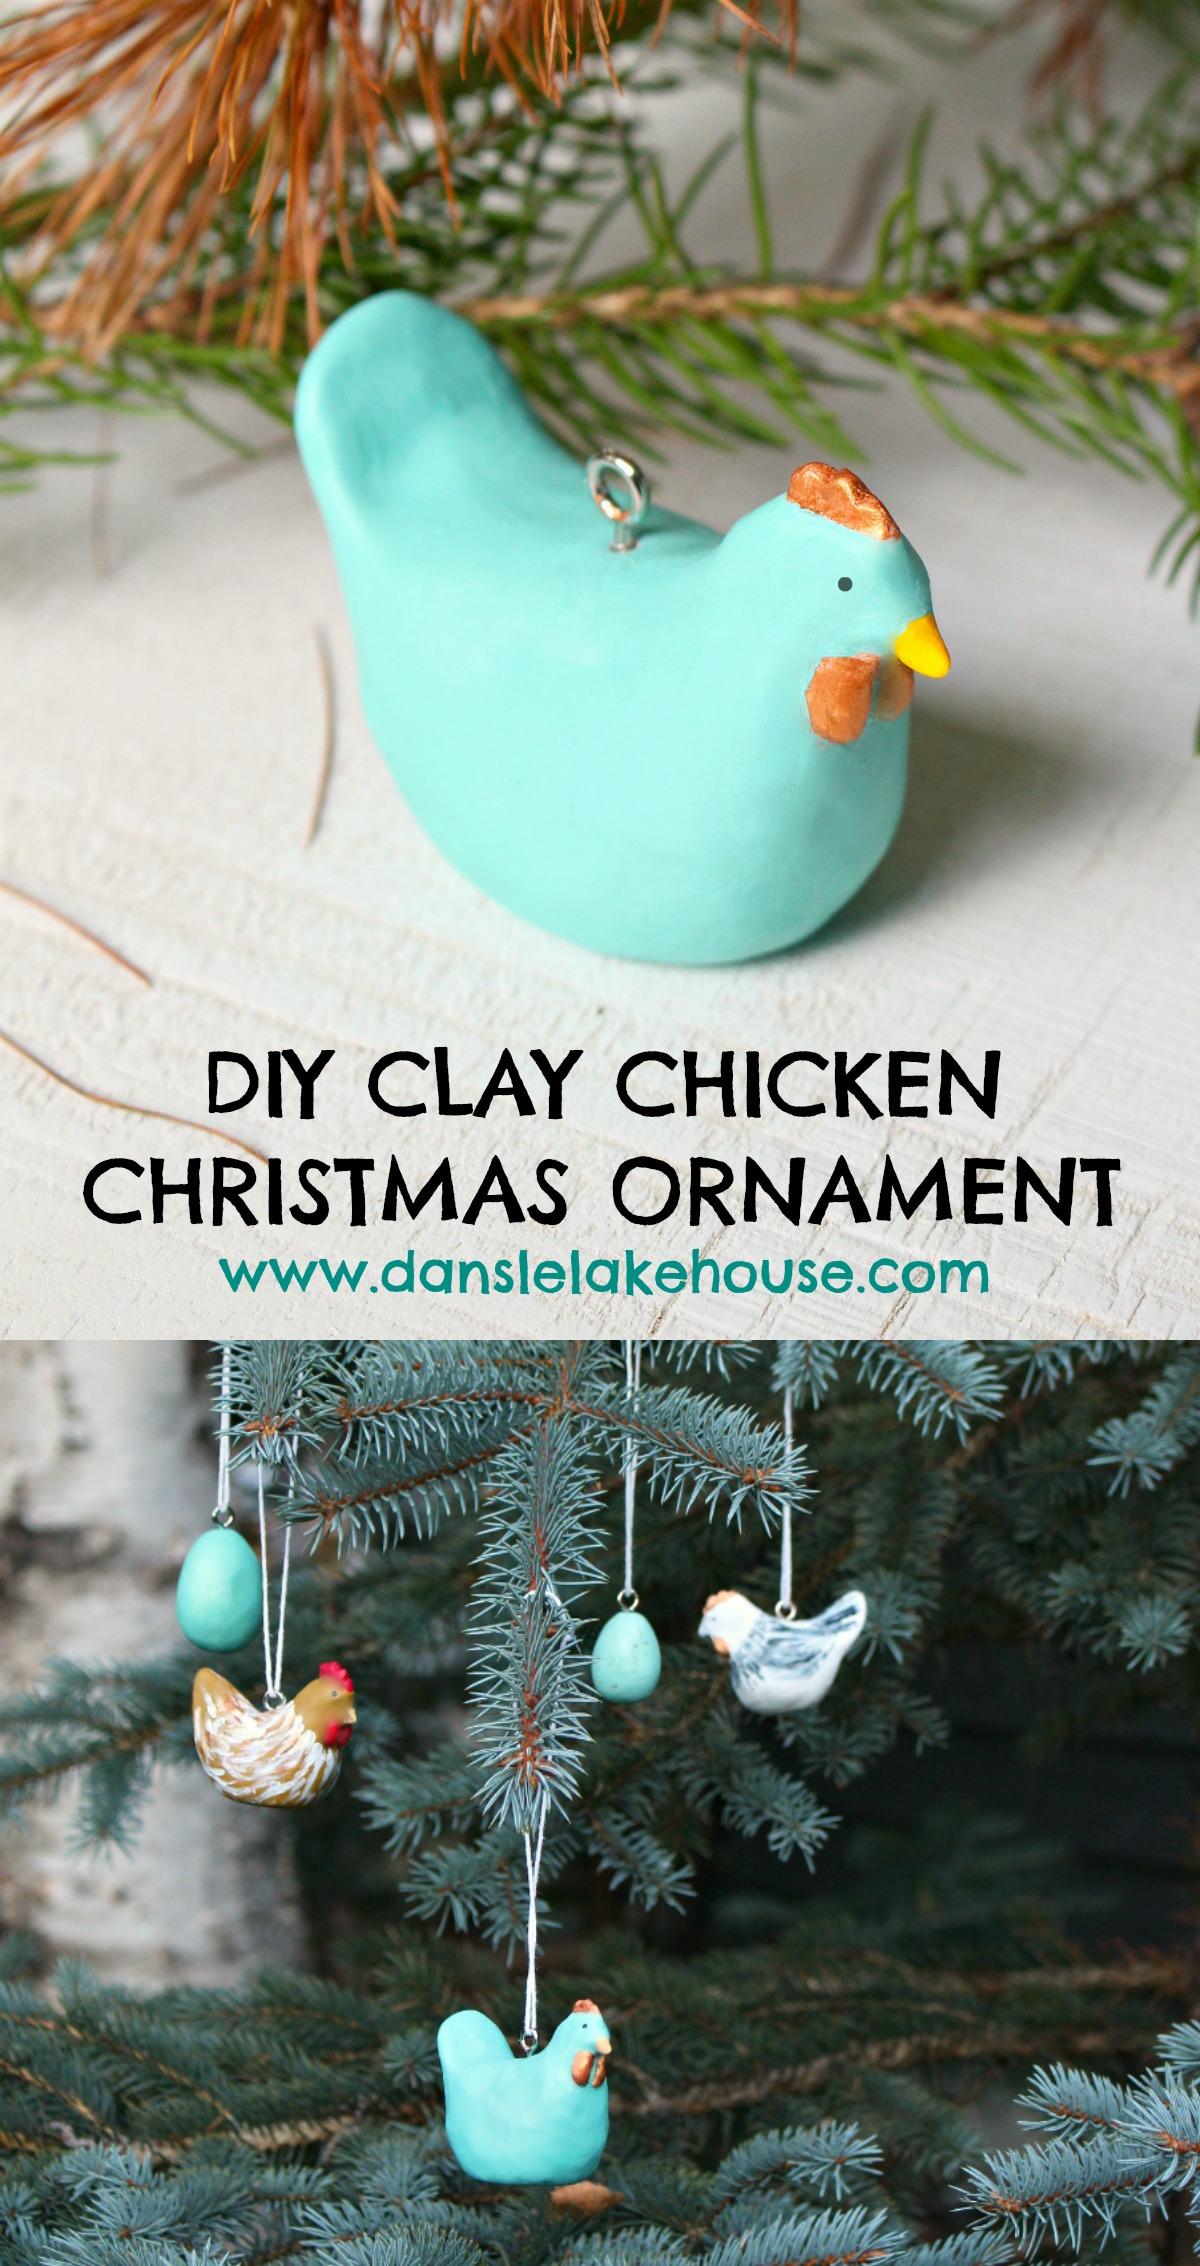 DIY Clay Chicken Christmas Ornament